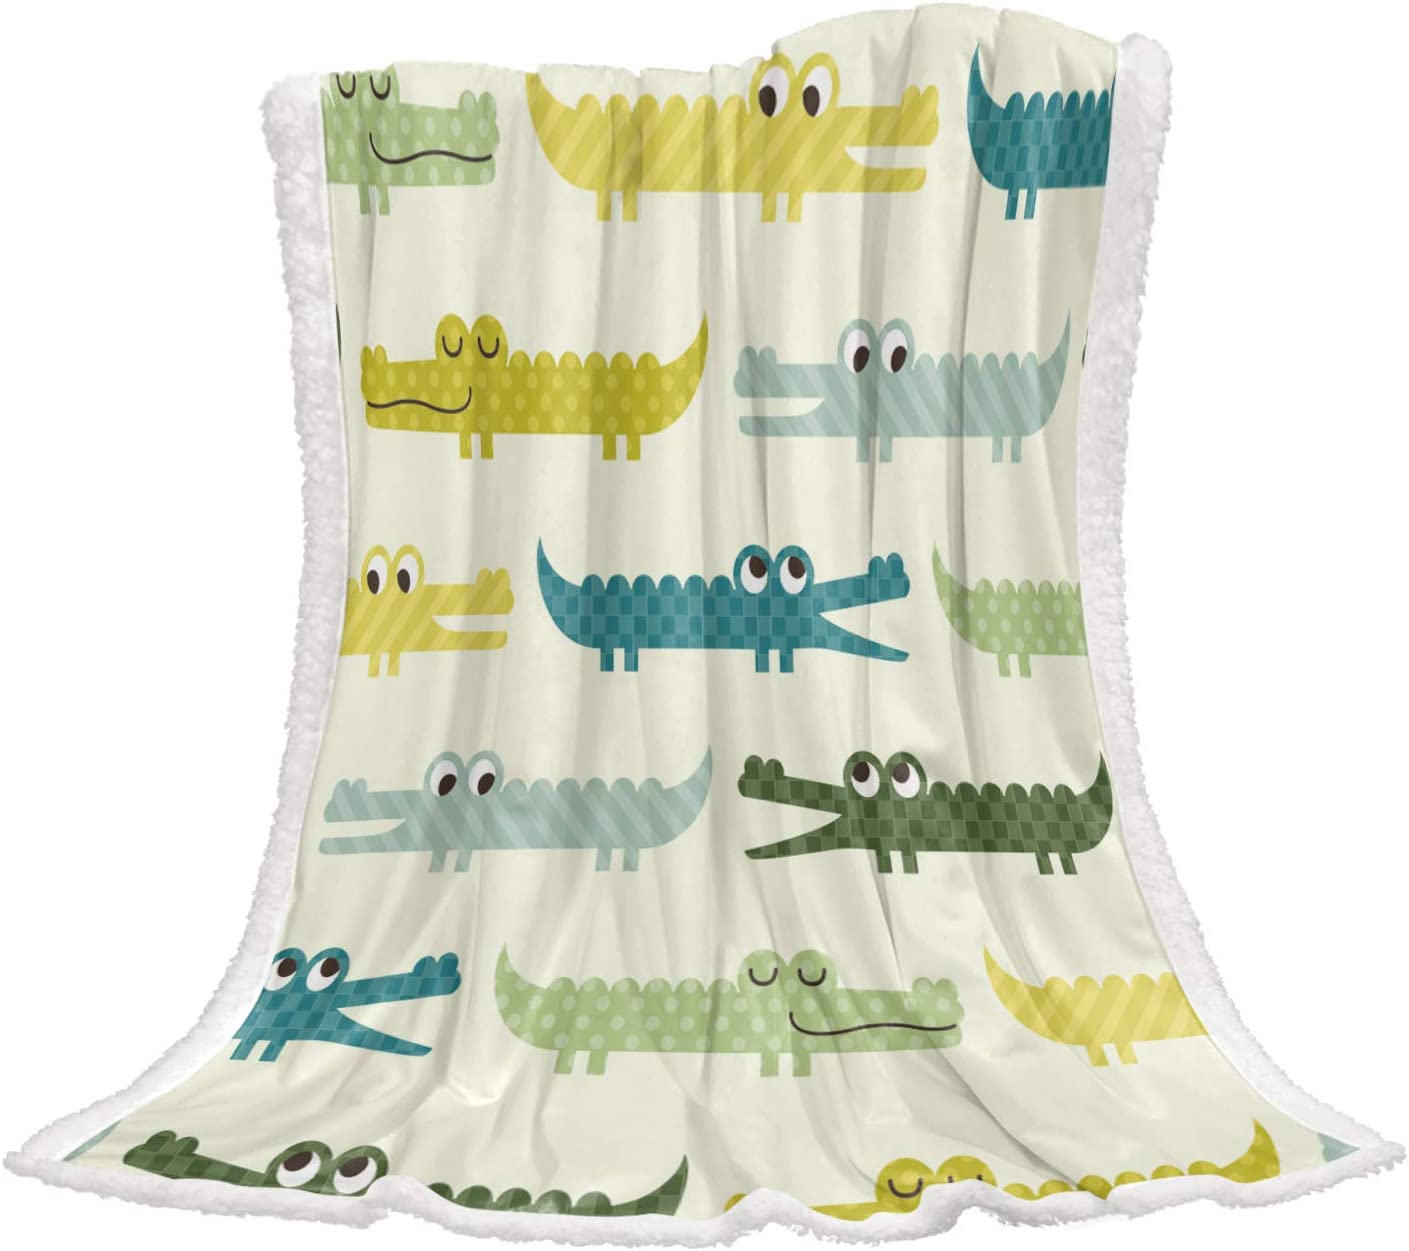 Meet 2021 spring and summer new 1998 Cartoon Crocodile Sherpa Blanket Flannel Fluffy Throw quality assurance